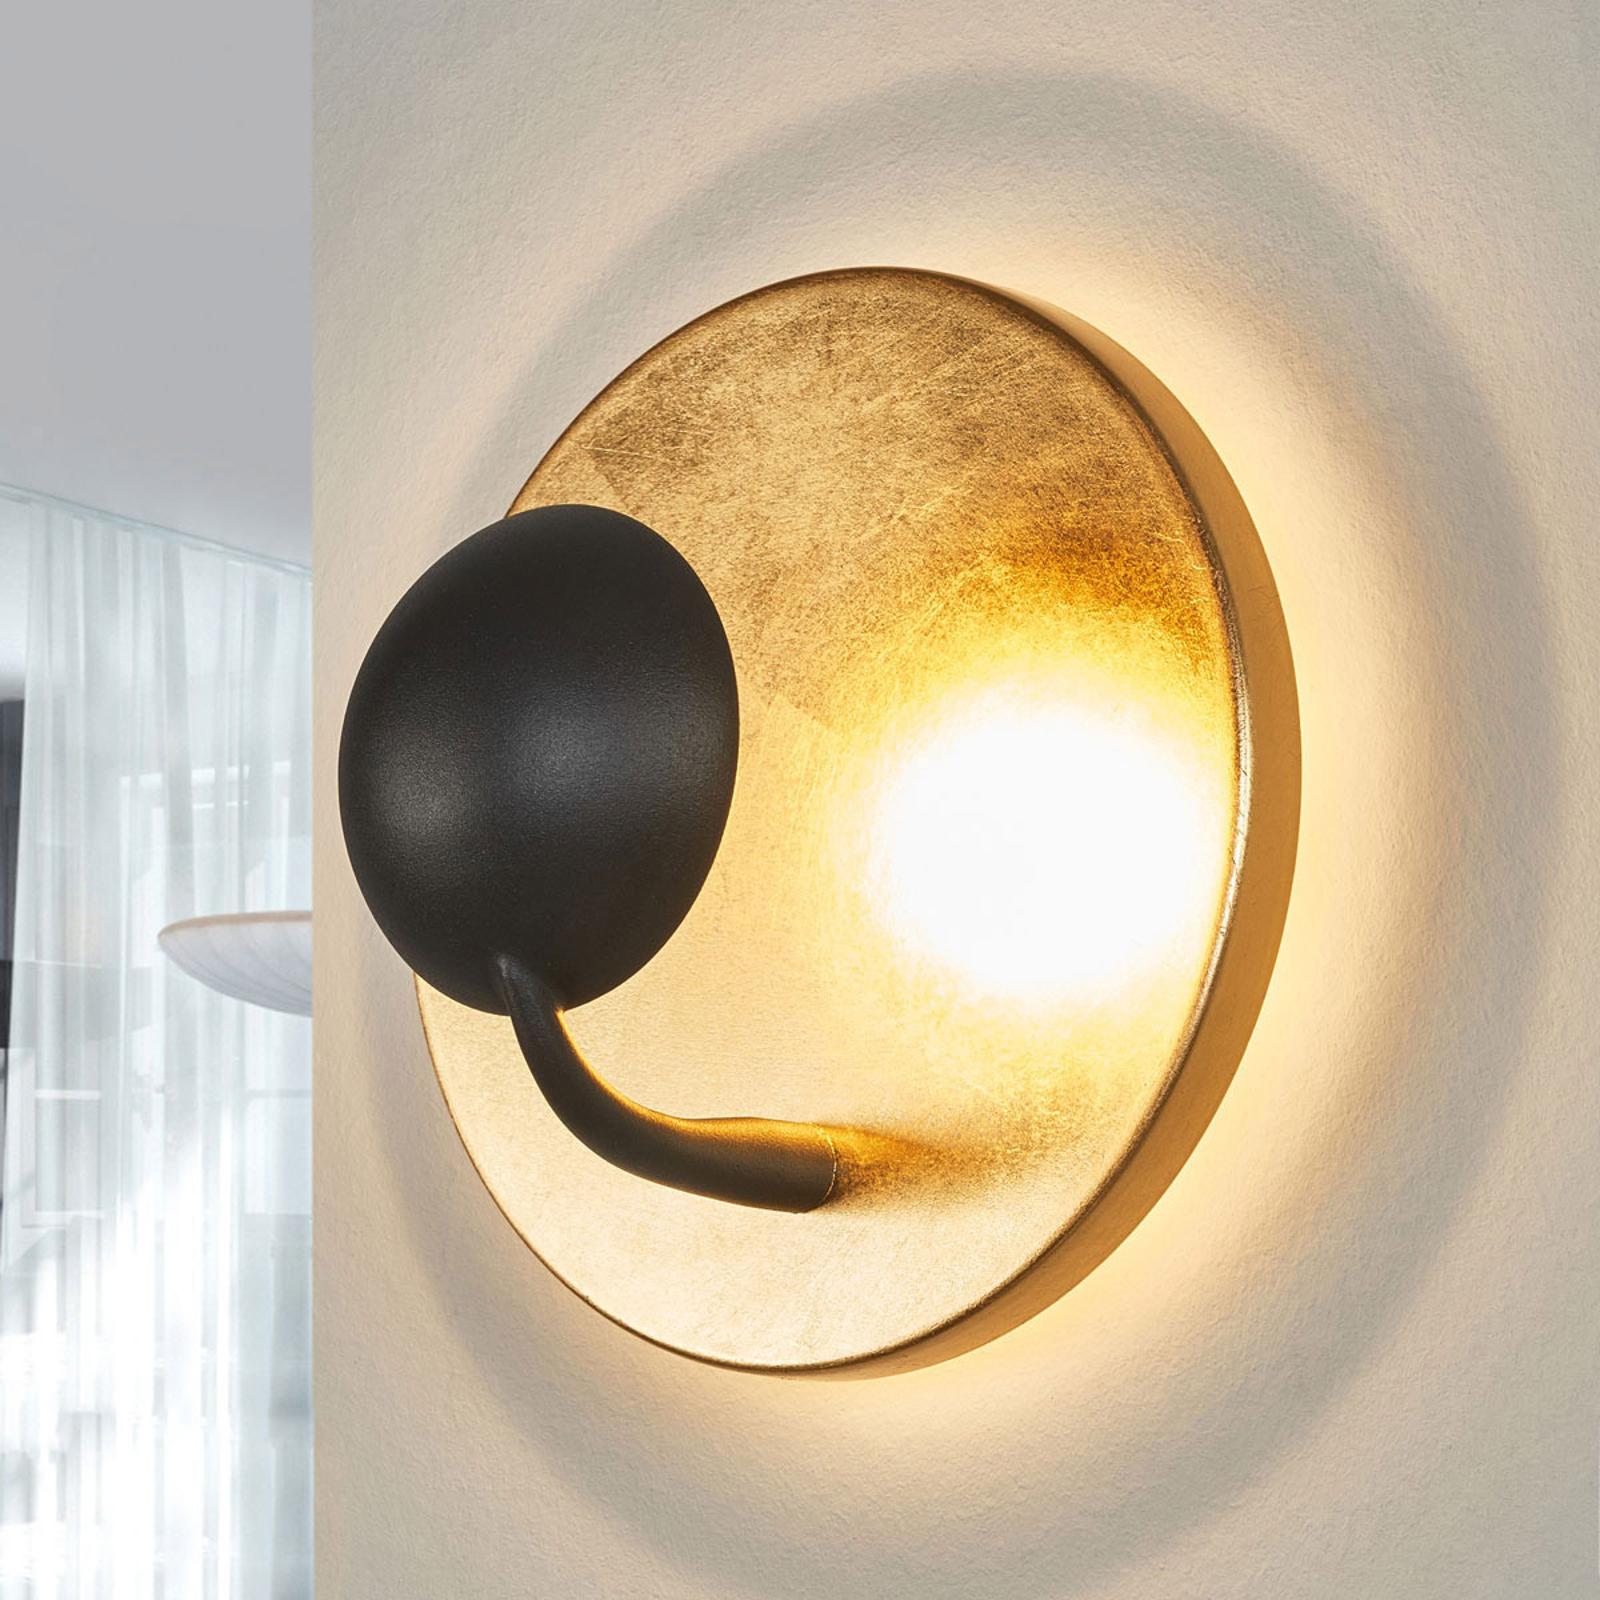 Extravagant LED-vägglampa Aurora svart-guld